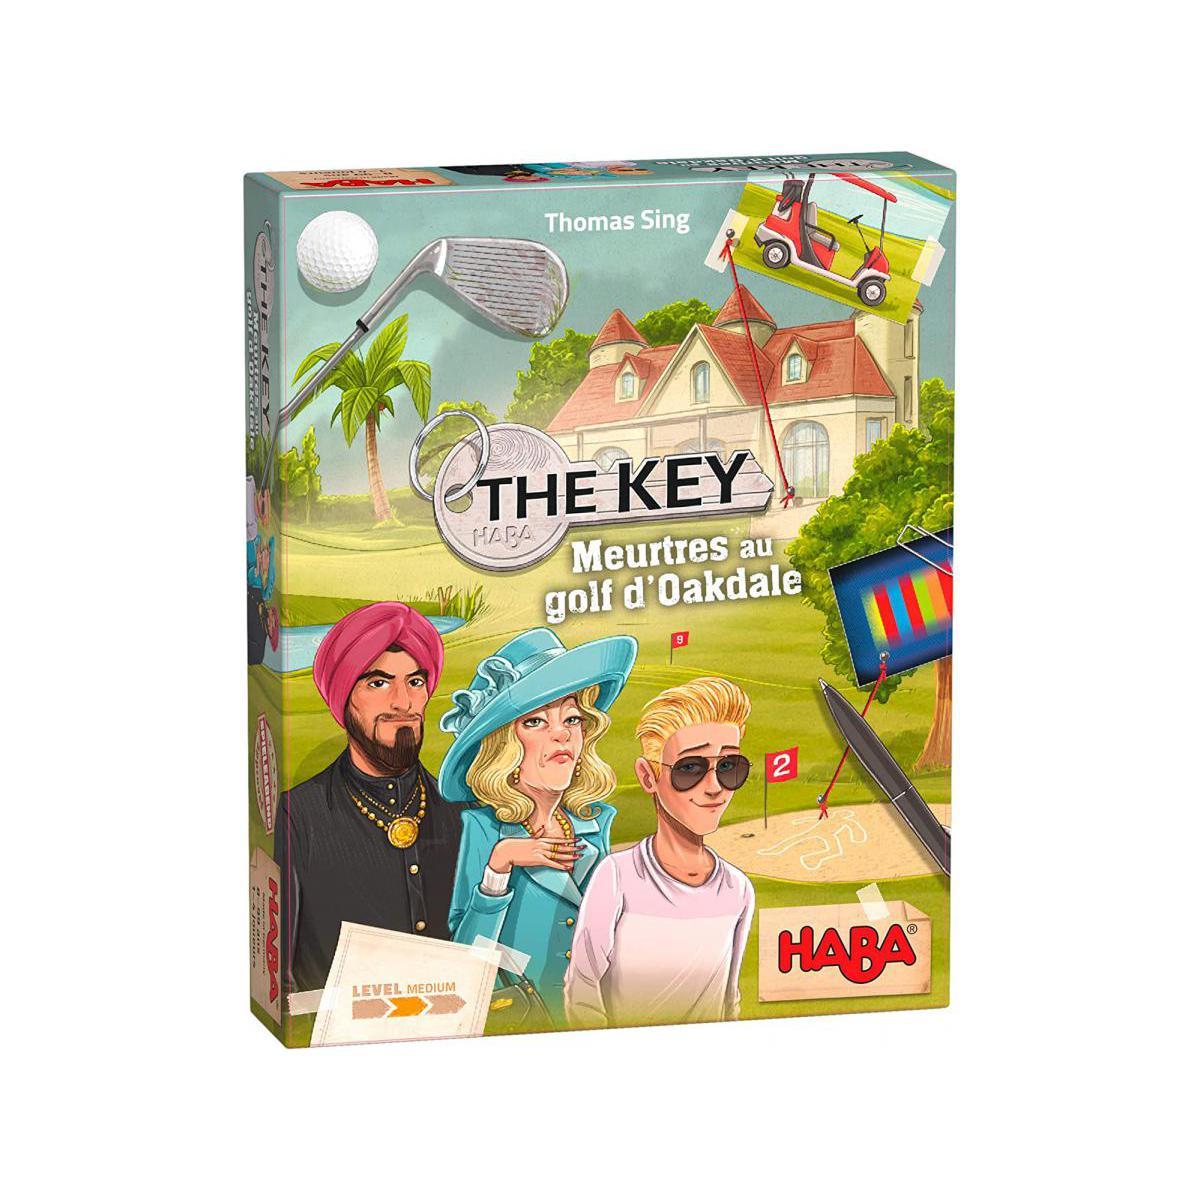 Haba Haba - The Key ? Meurtres au golf d'Oakdale